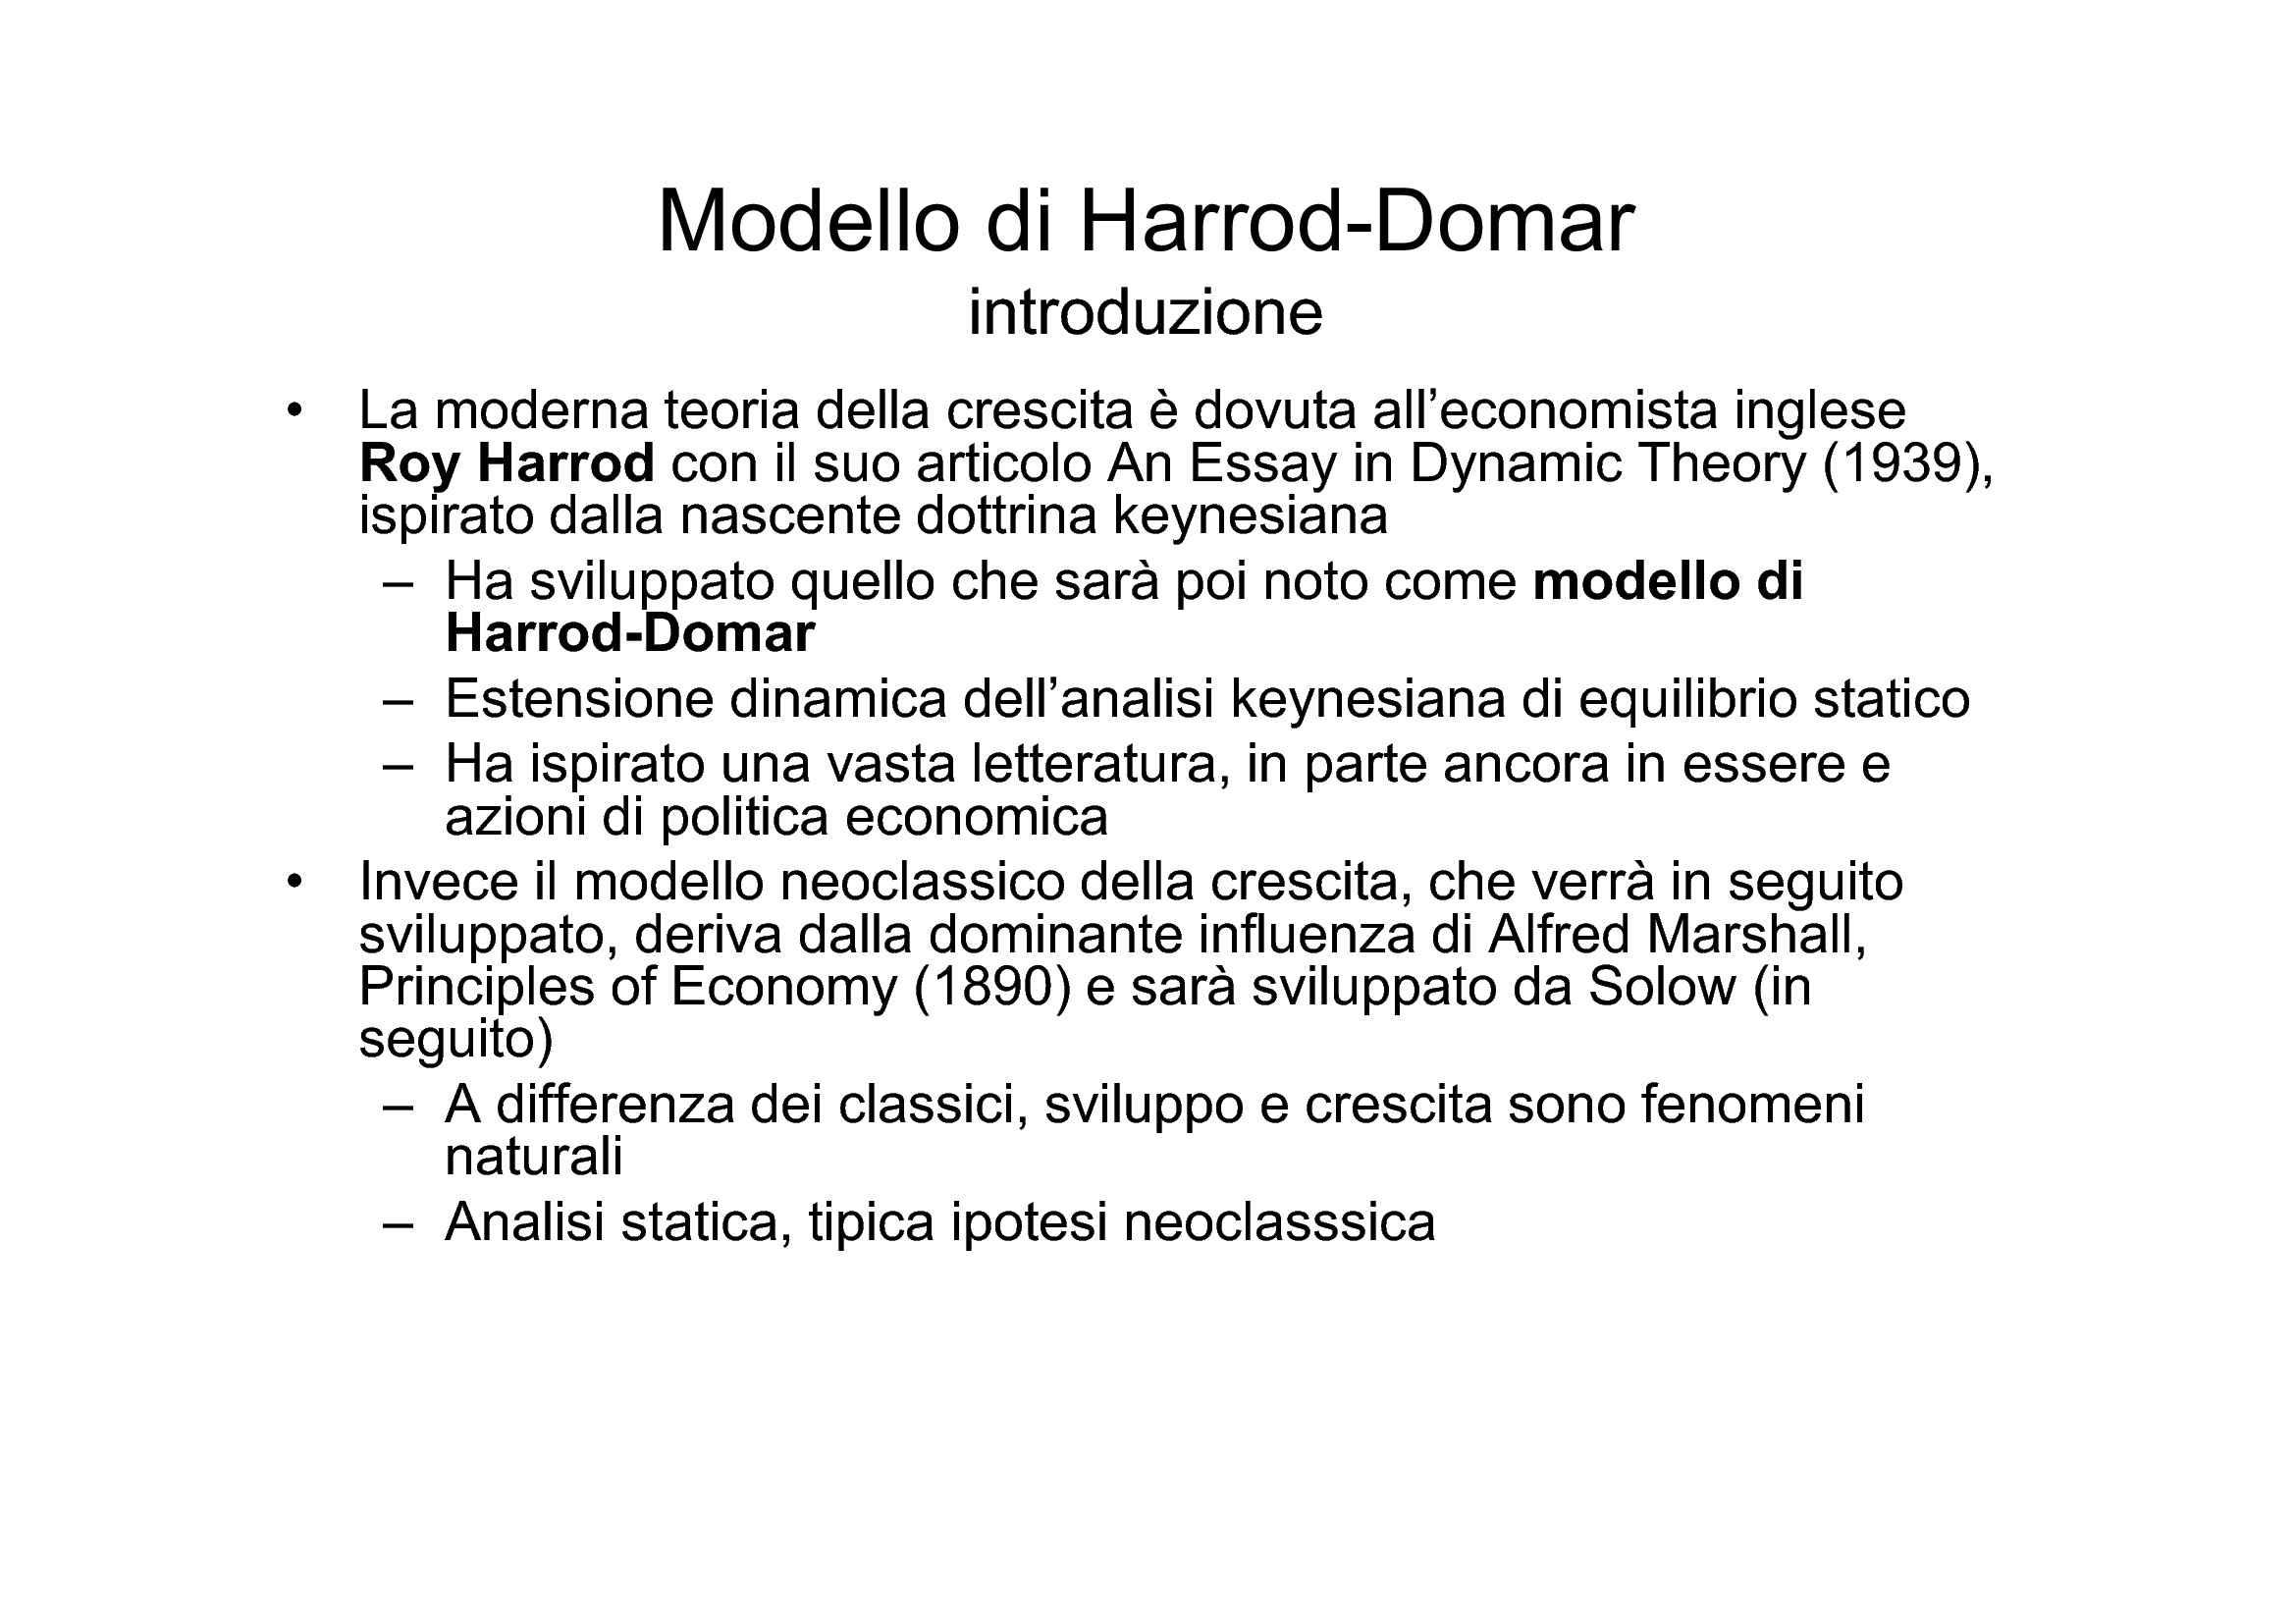 Modello Harrod-Domar